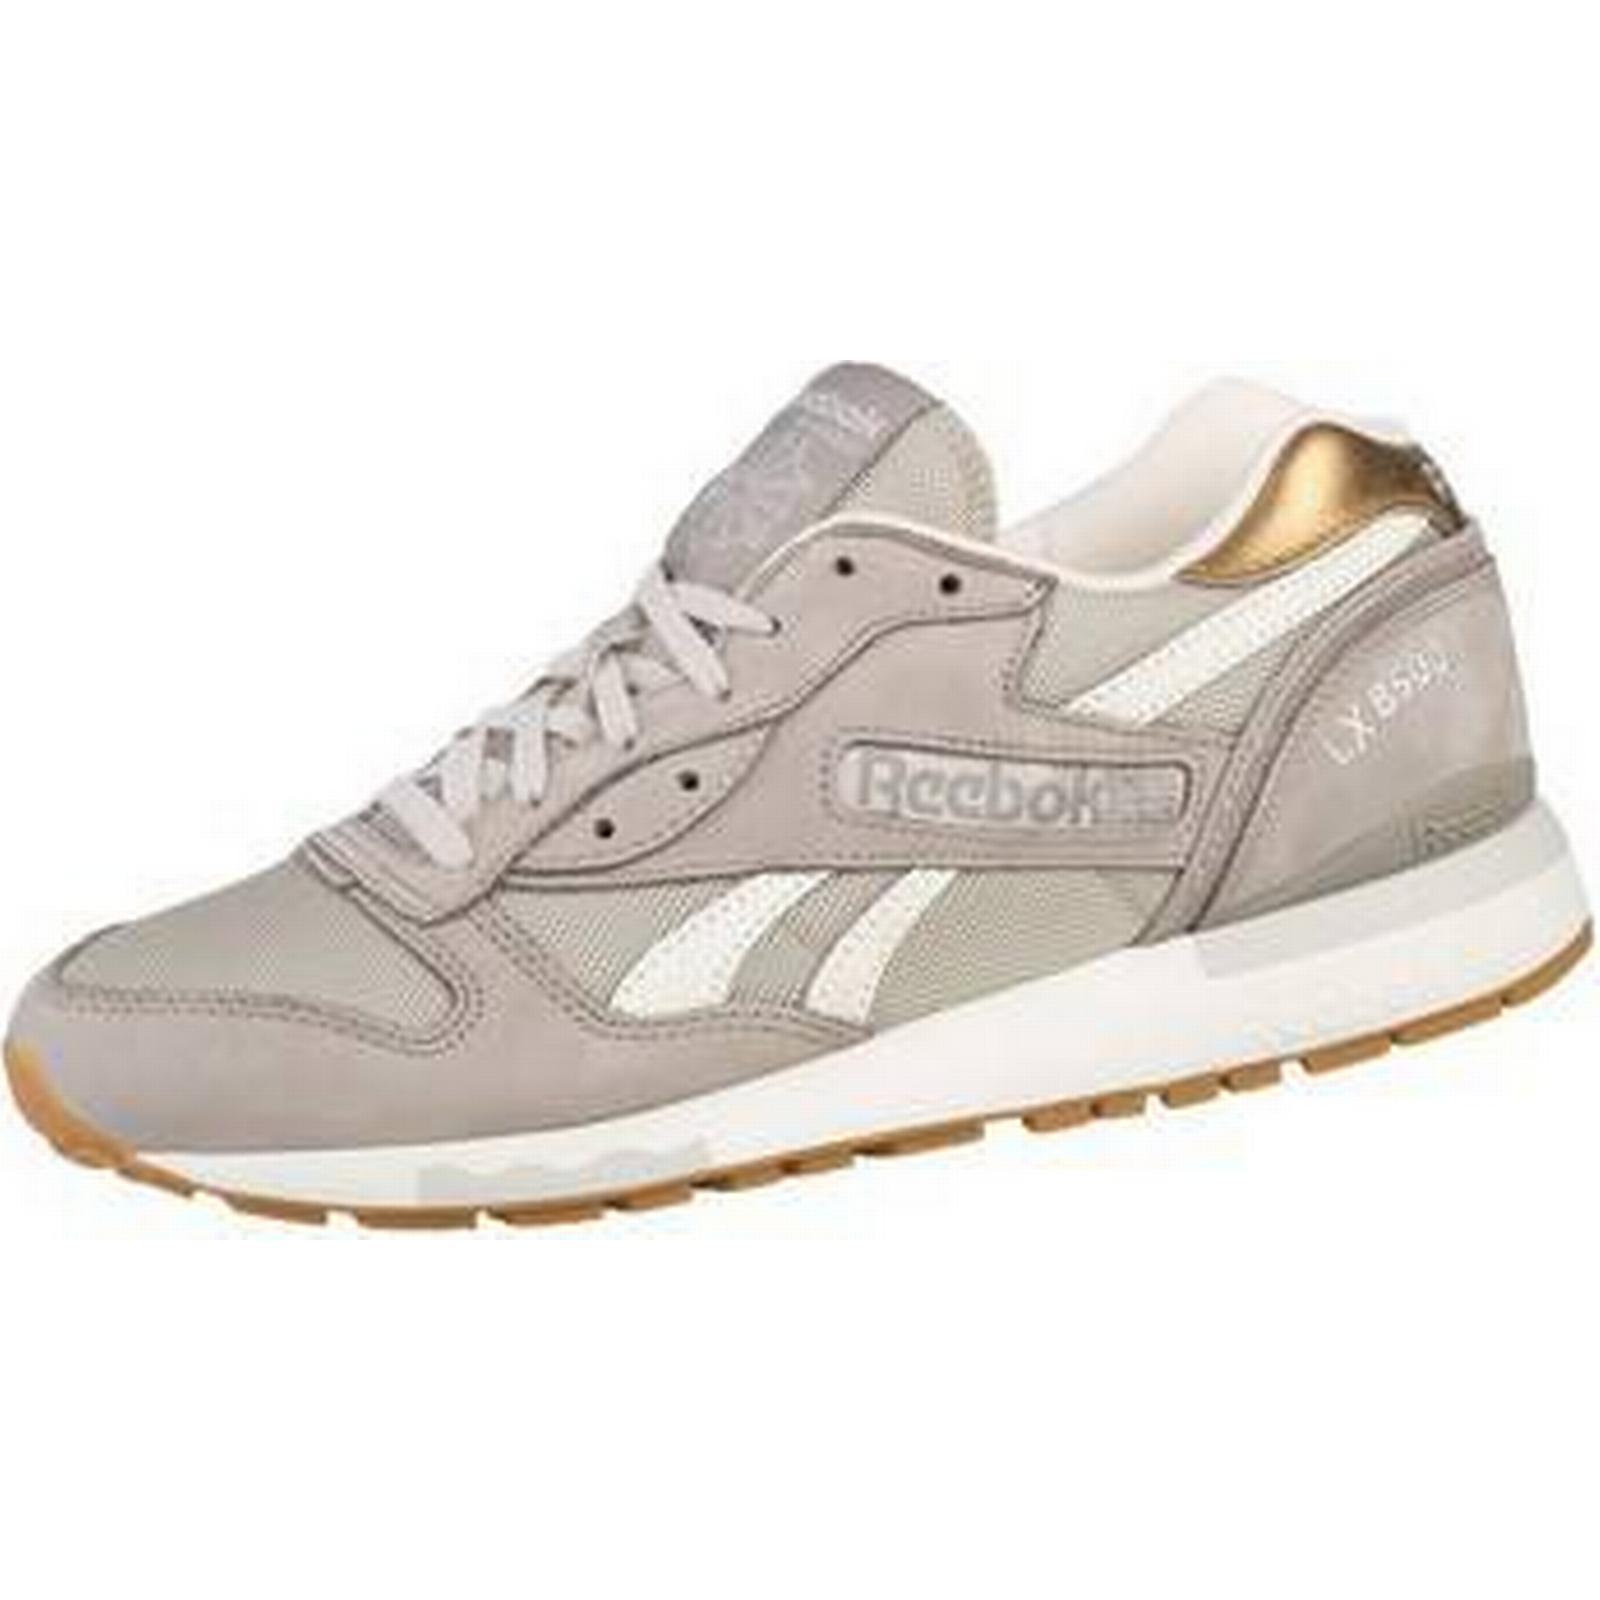 half off f922a b2cea ... Spartoo.co.uk Reebok Sport LX 8500 8500 8500 Met men s Shoes (Trainers